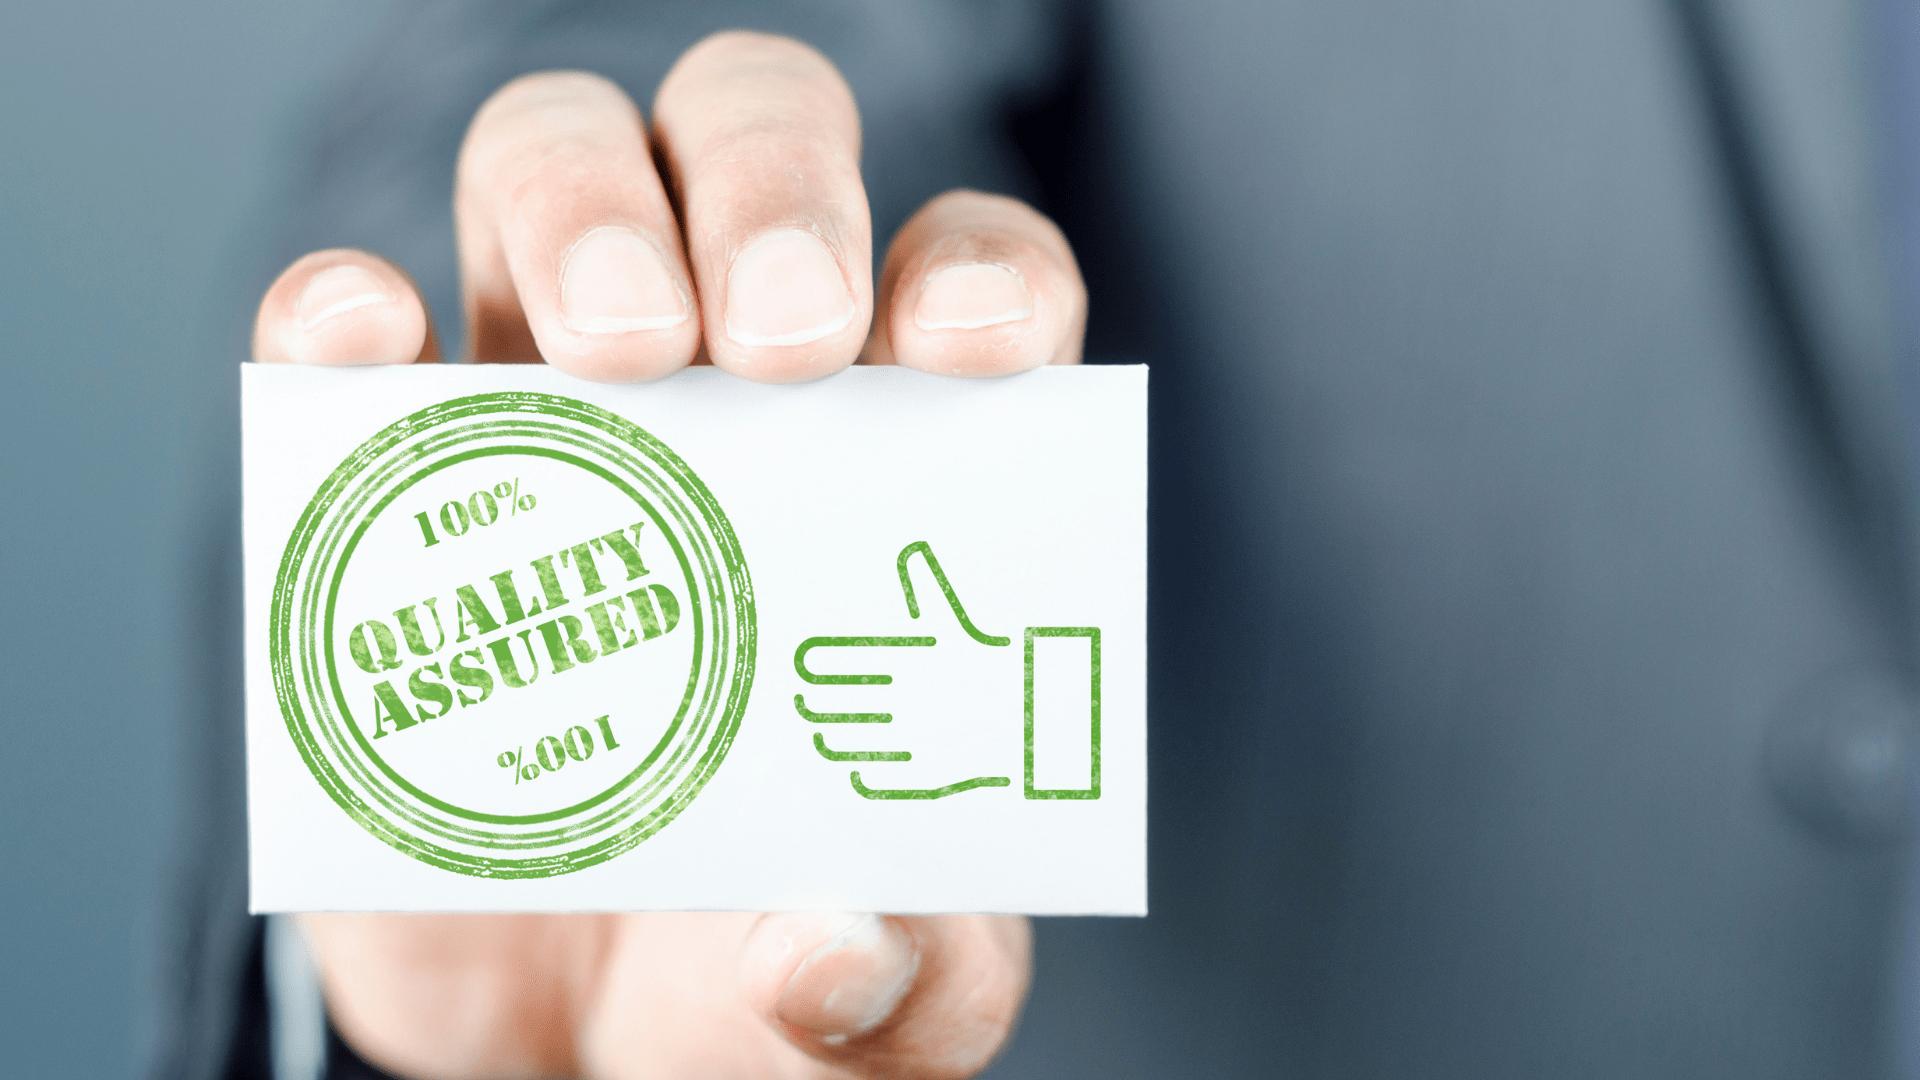 Certificazione Aziendale Qualità Ambiente Sicurezza